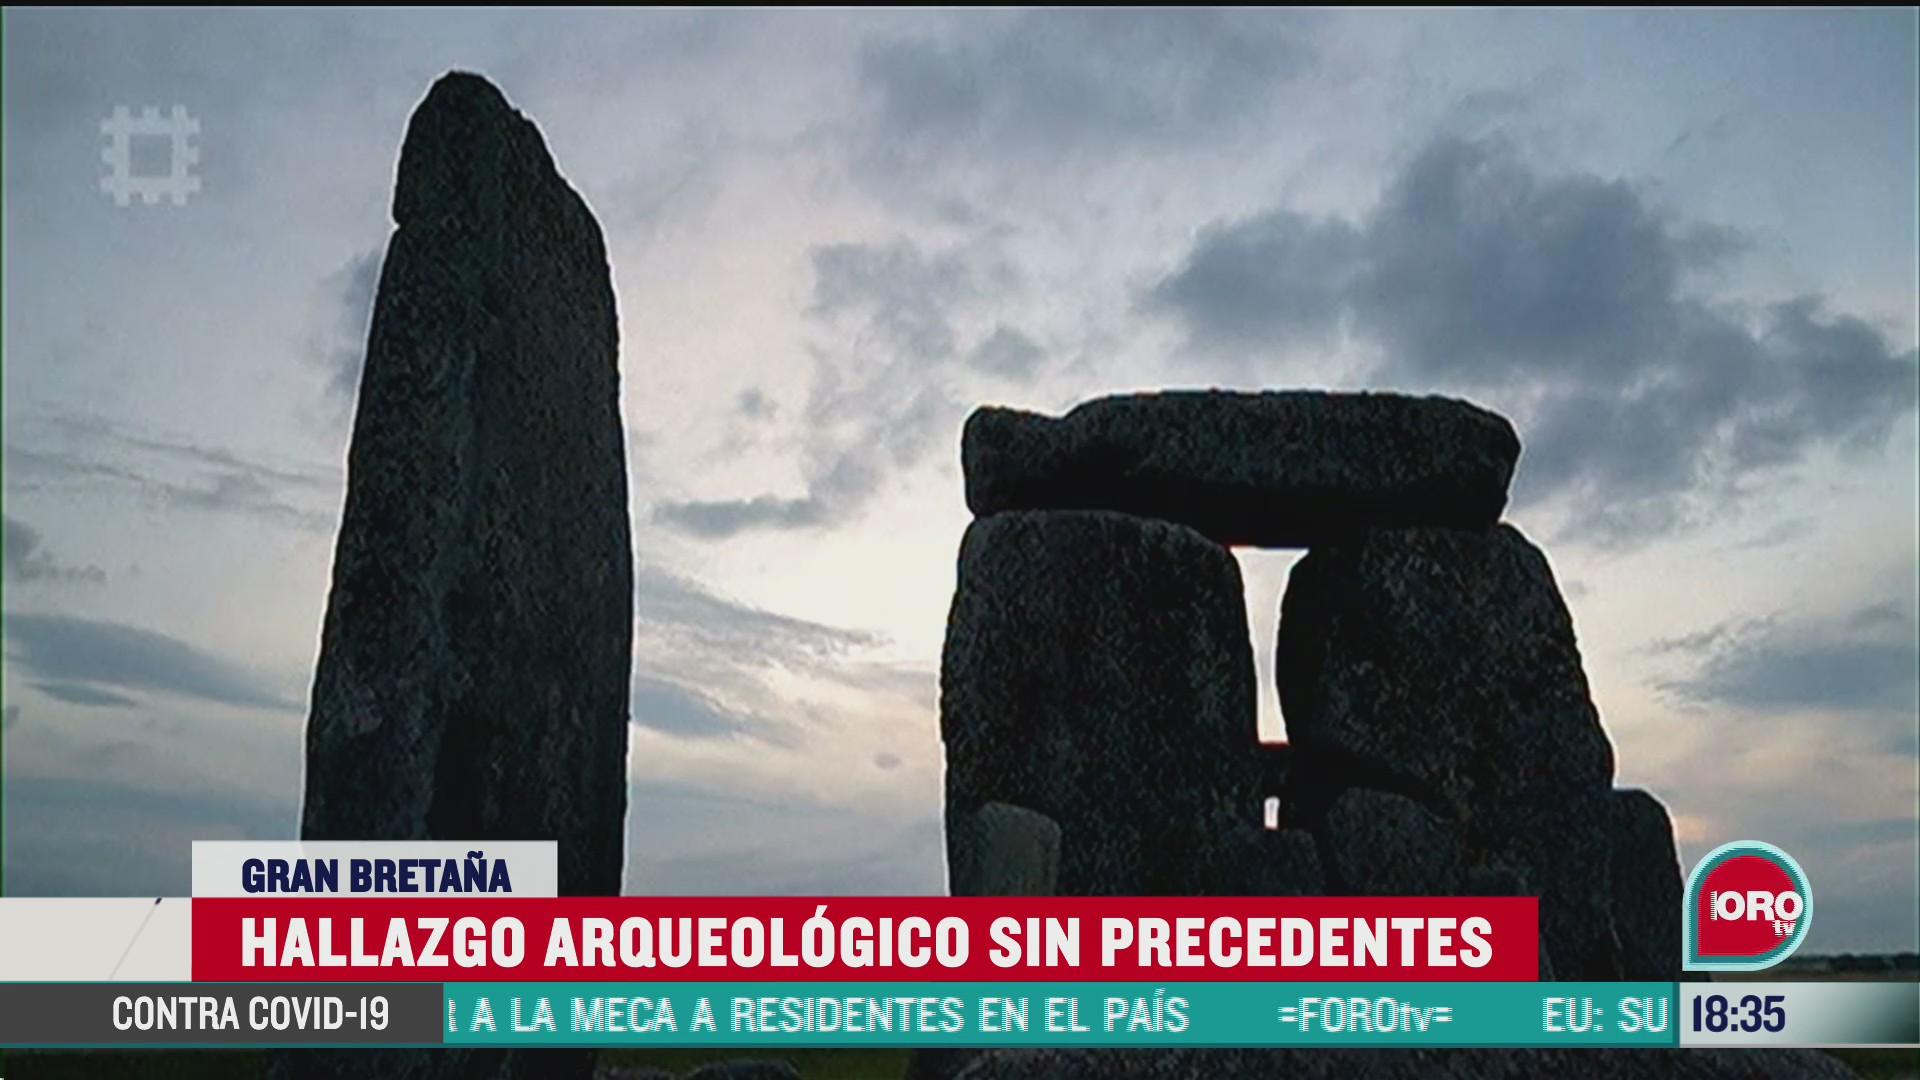 FOTO: hallan anillo prehistorico de pozos en gran bretana